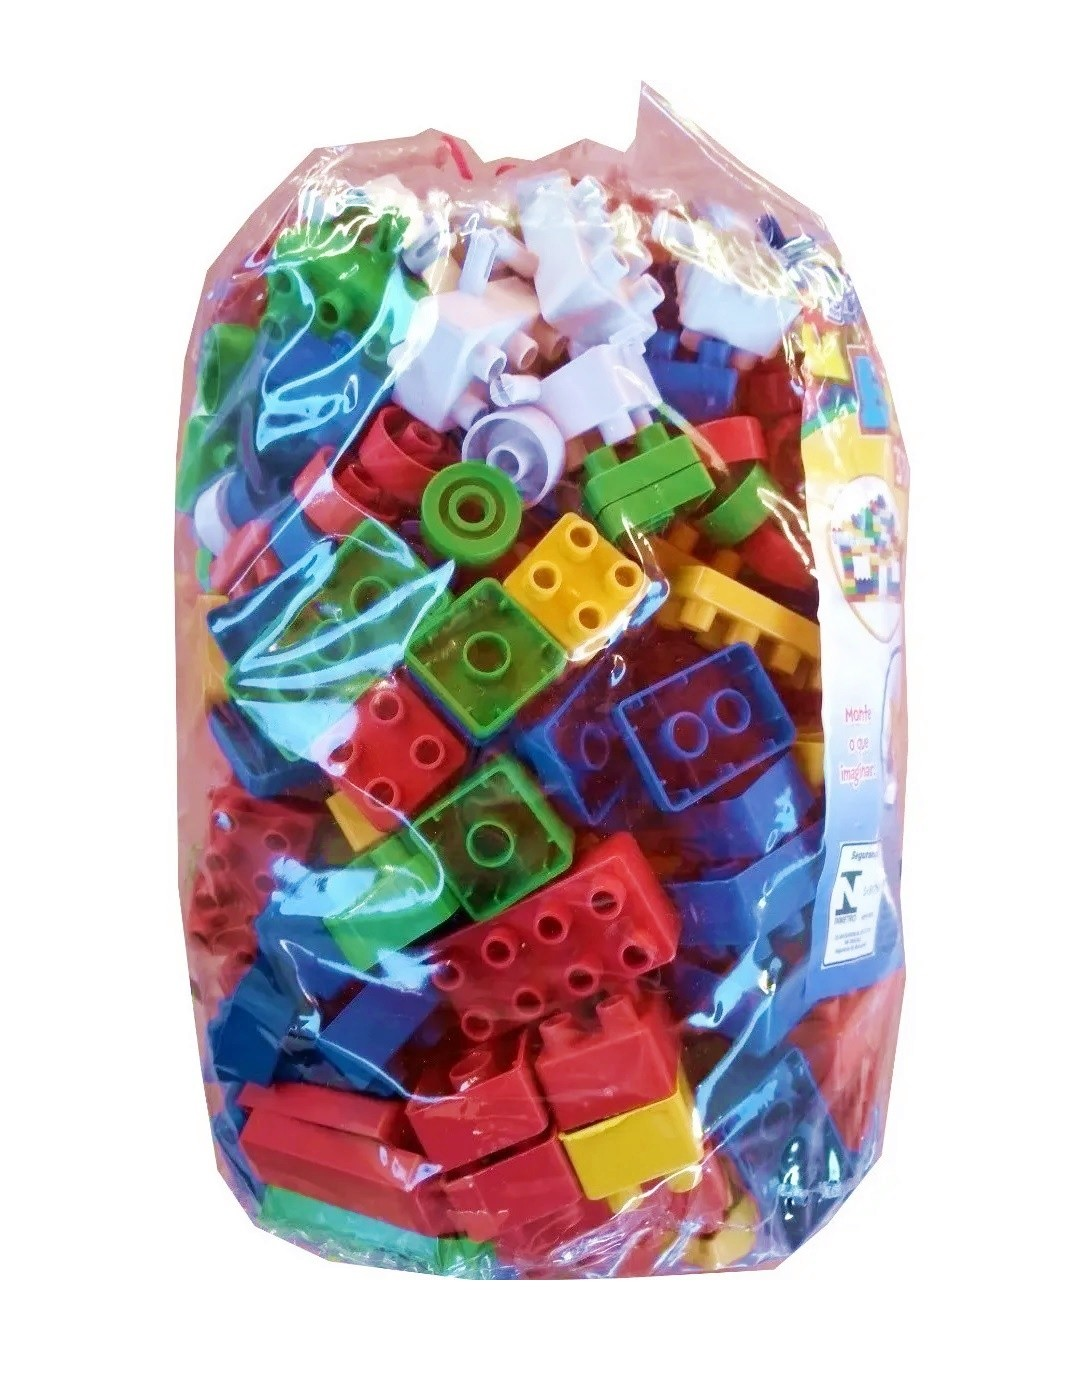 Blocos de Montar Super Blocks 334 Peças Médias Sortidos - World Blocks Kids